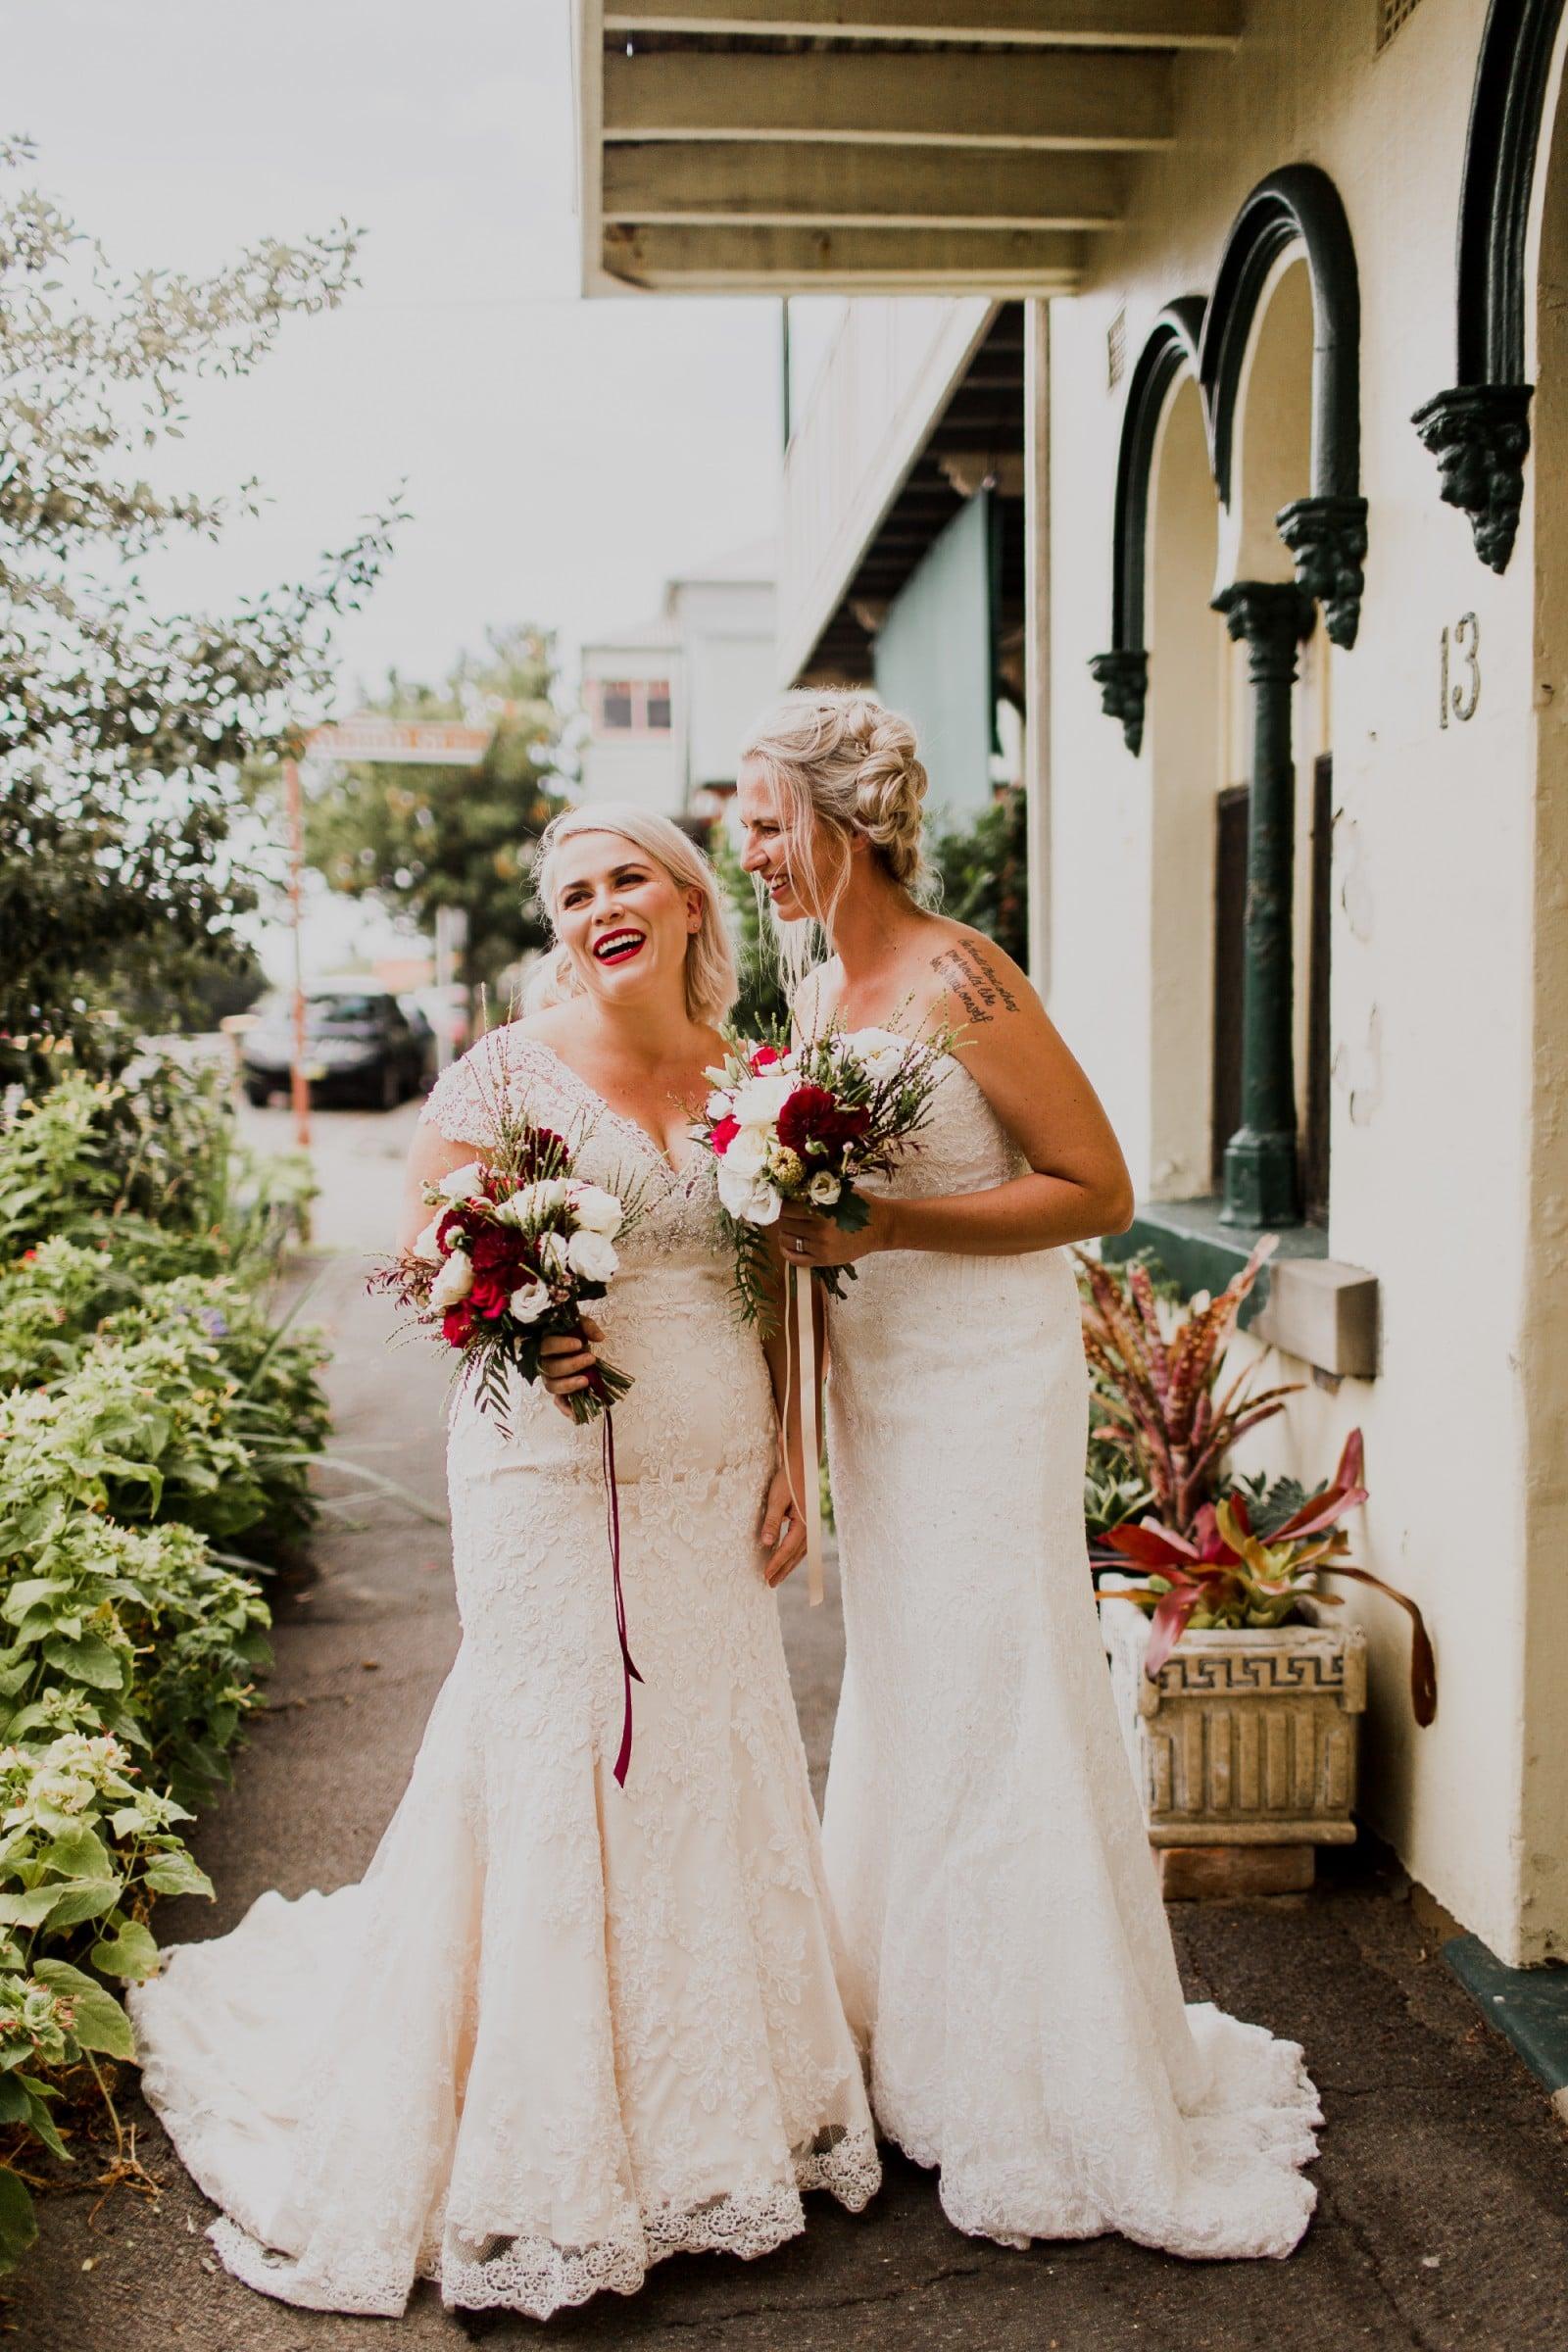 5 Surefire Ways to Find Your Dream Eco-Friendly Wedding ...